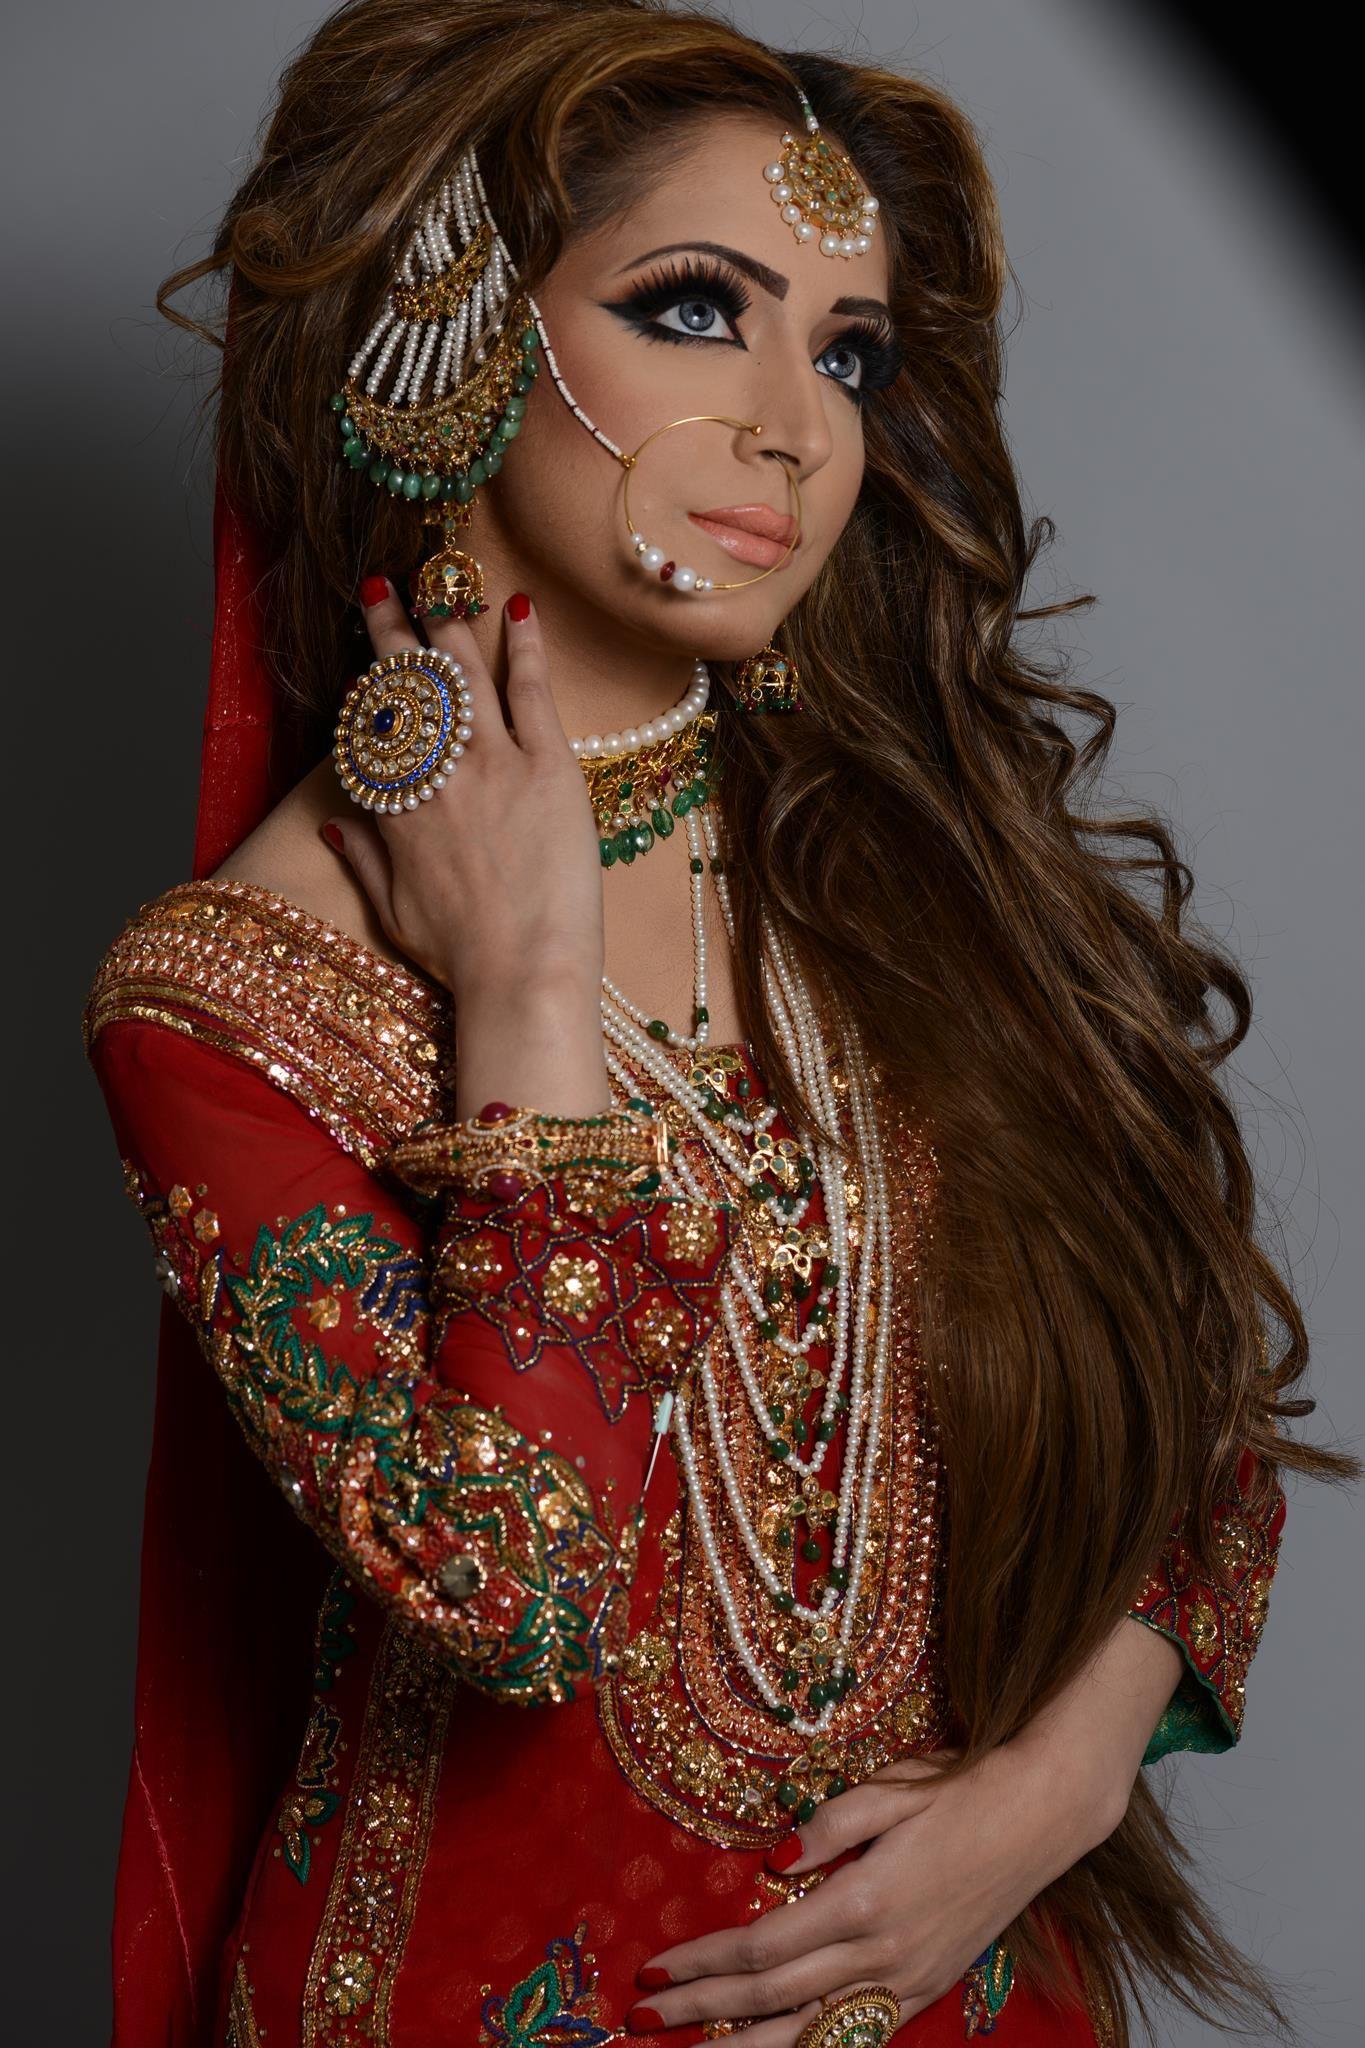 naeem khan. stunning #bride | head accessories-tikka's & passa's